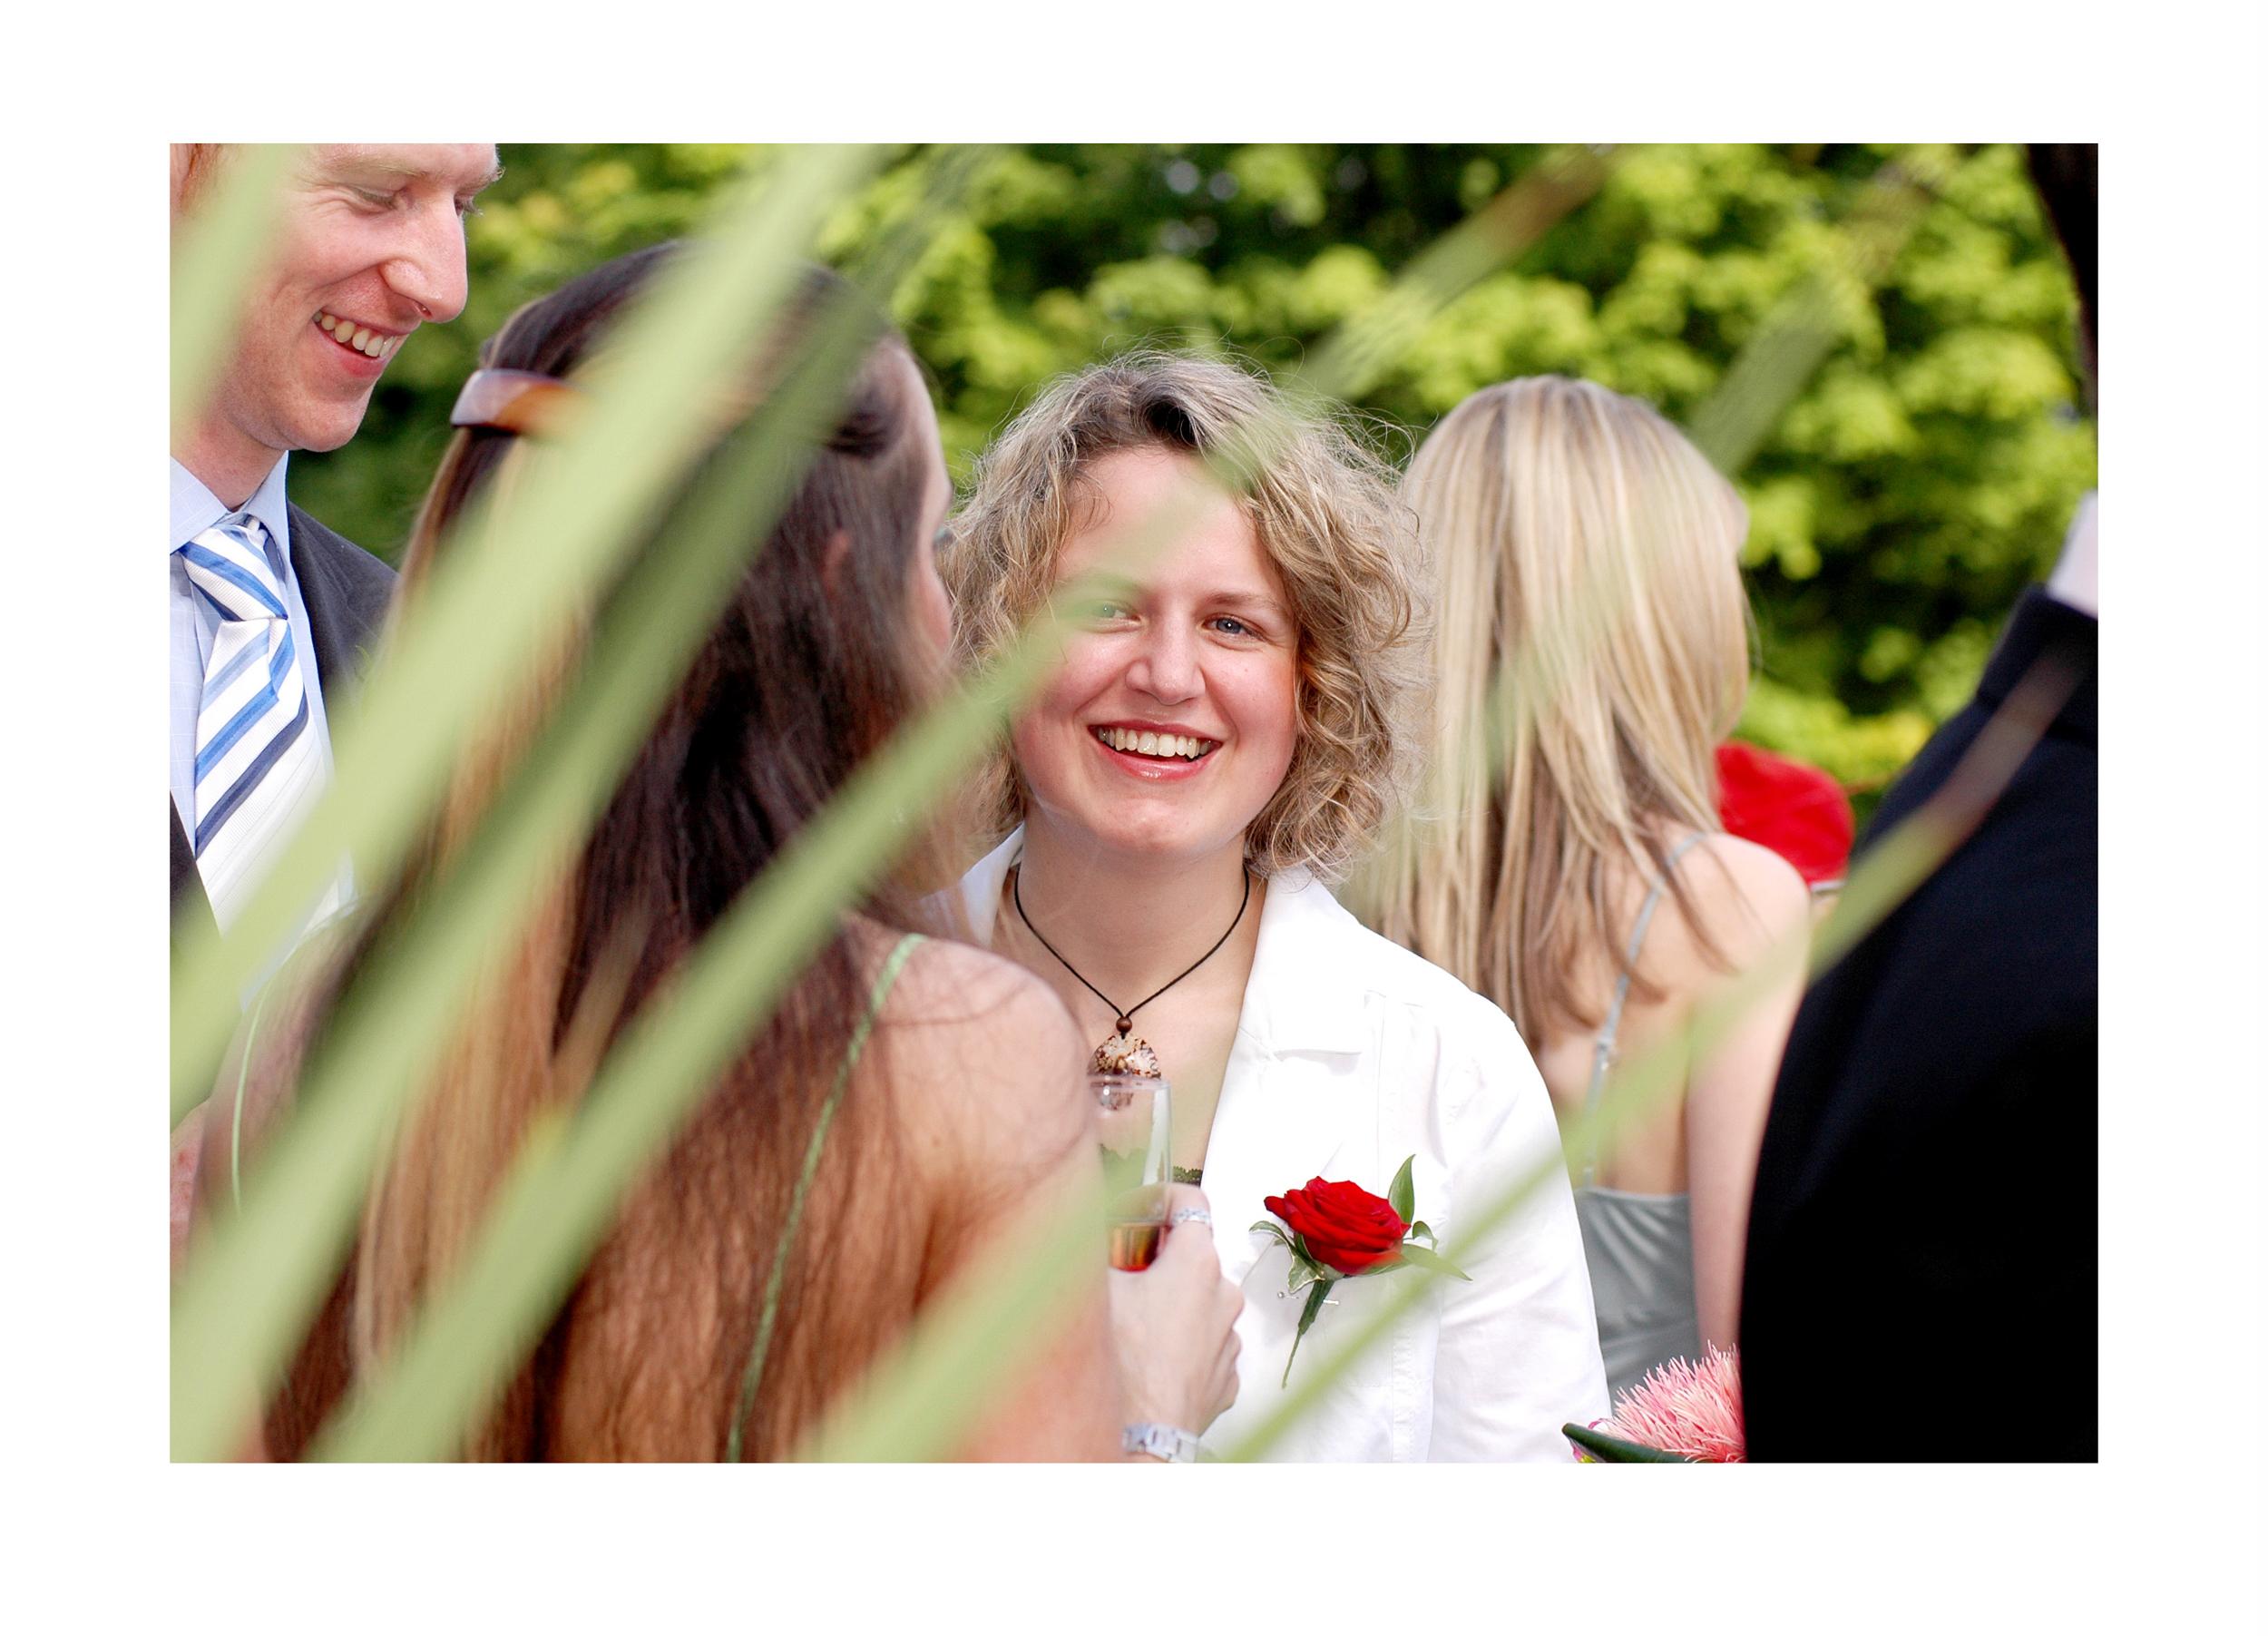 REPORTAGE-WEDDING-PHOTOGRAPHY-SET-UK-28.jpg